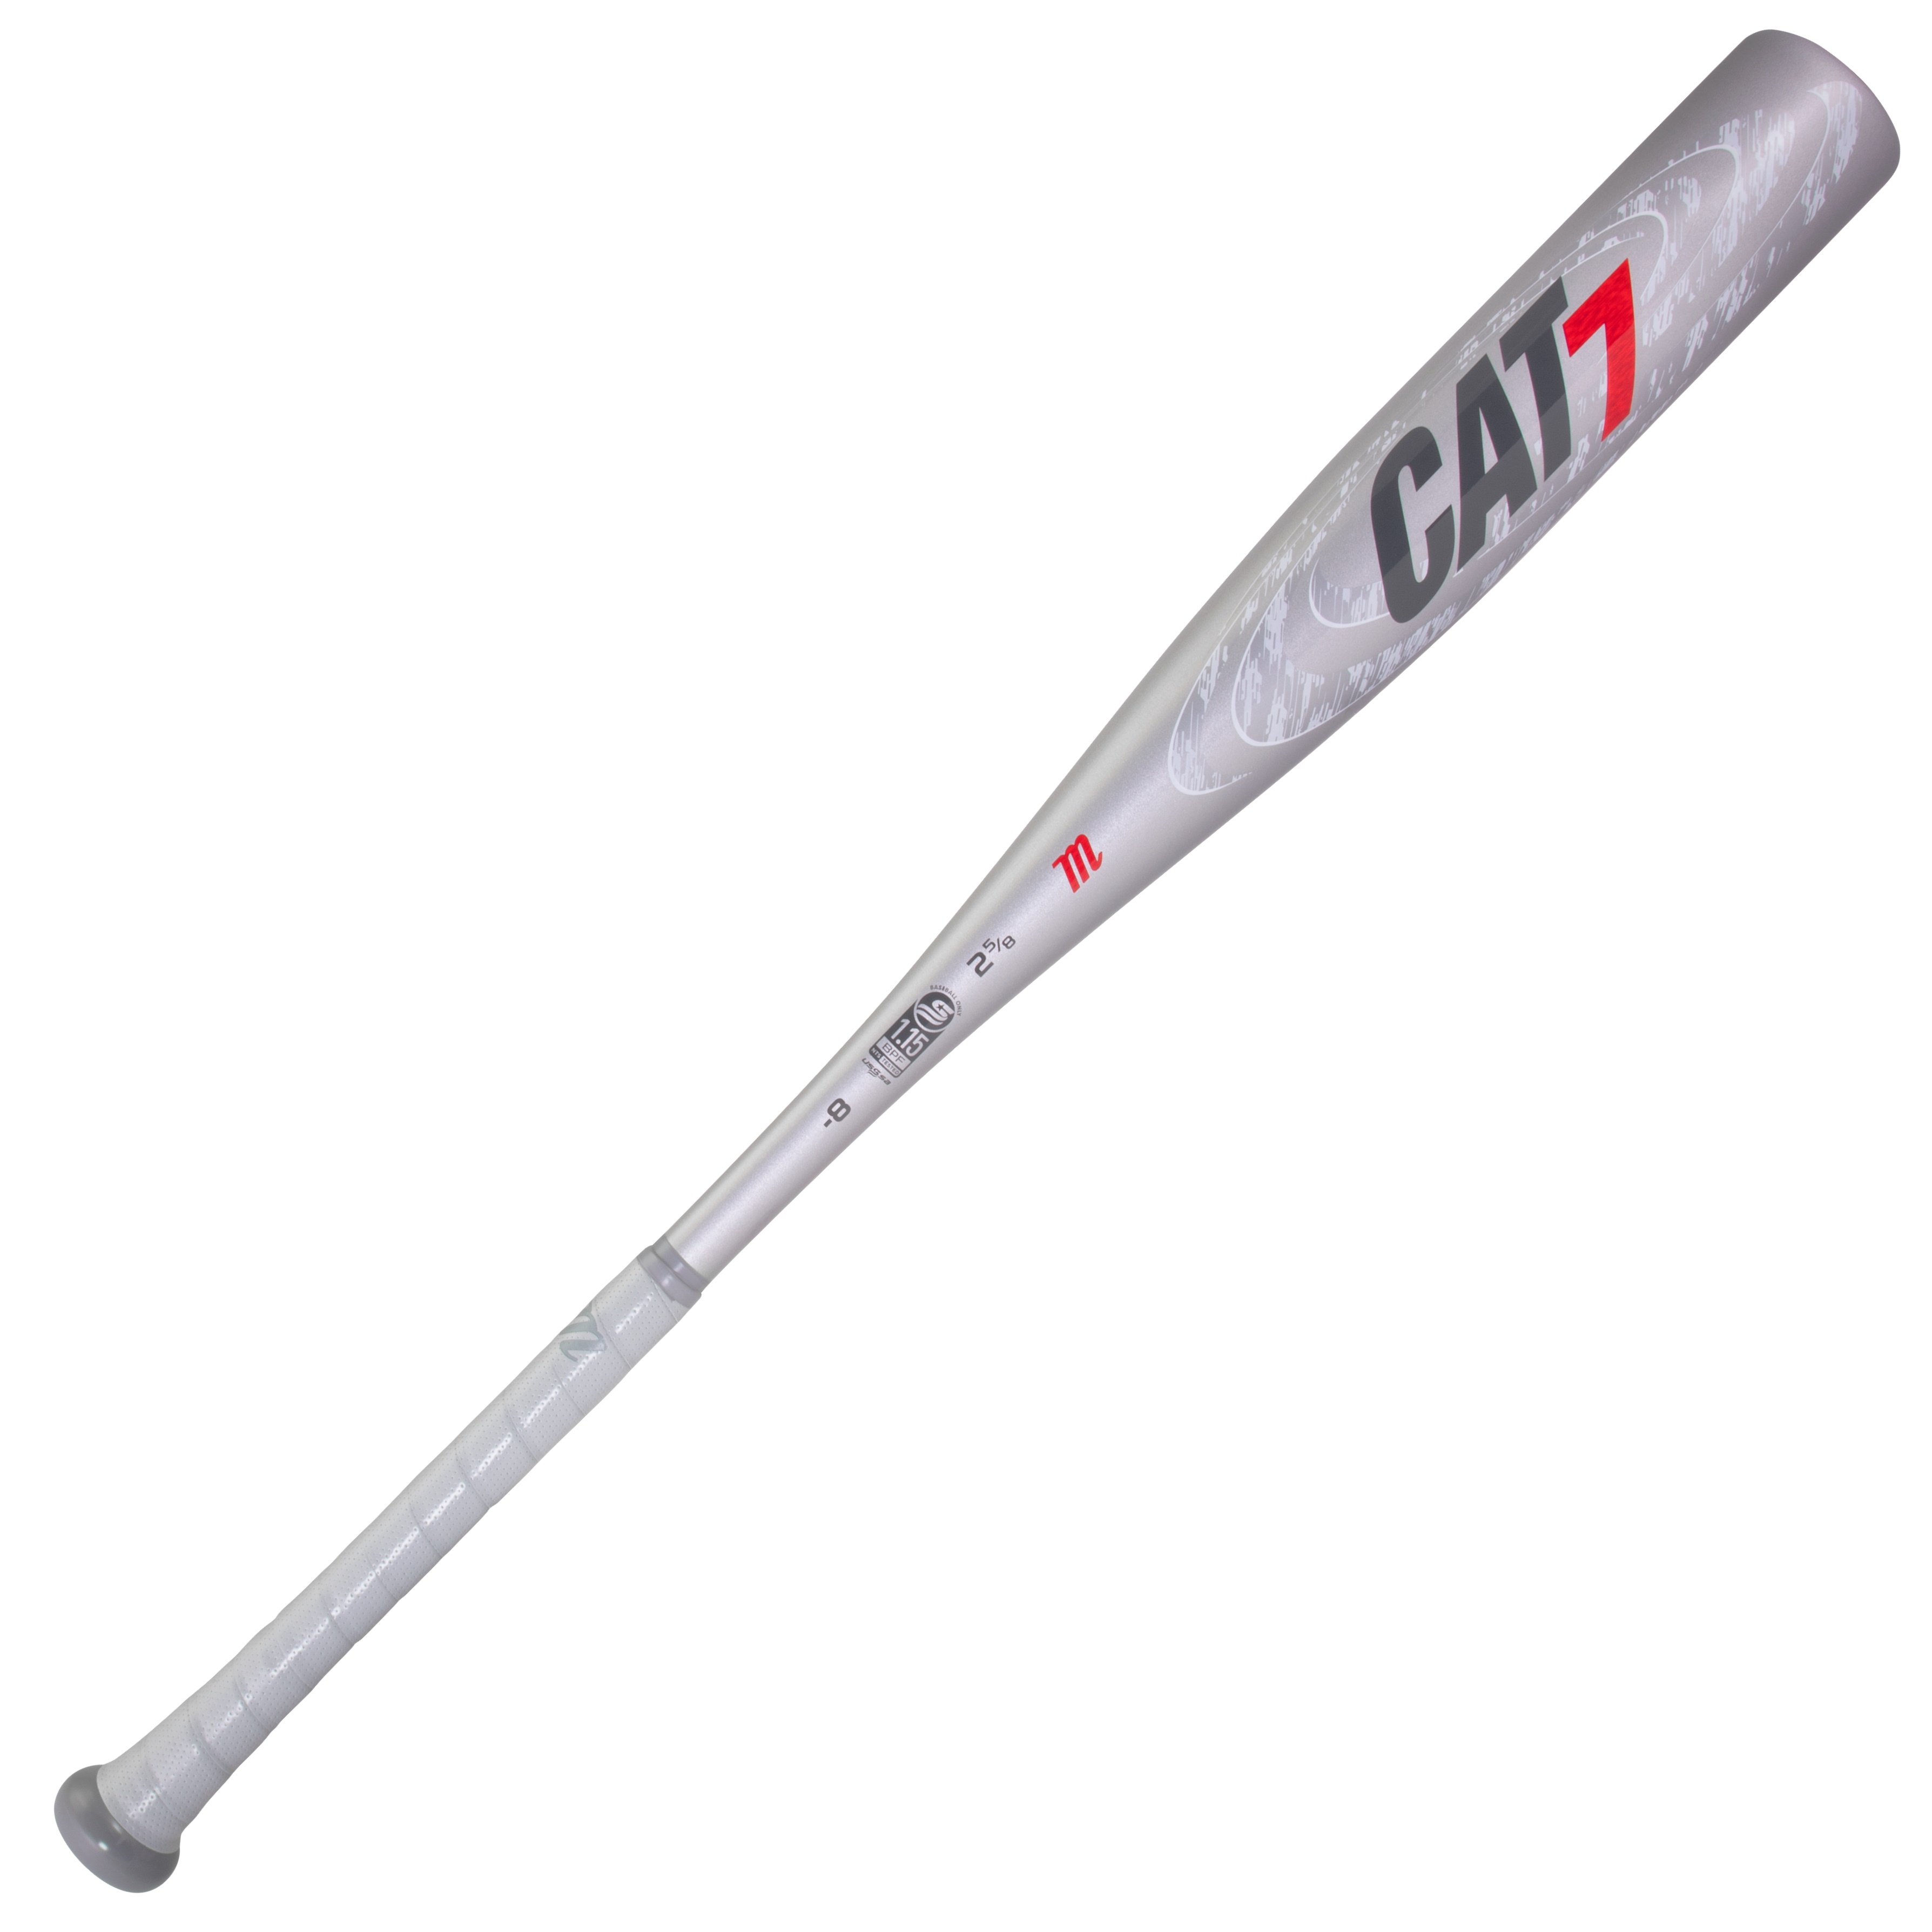 marucci-cat7-silver-8-baseball-bat-32-inch-24-oz MSBC728S-3224 Marucci